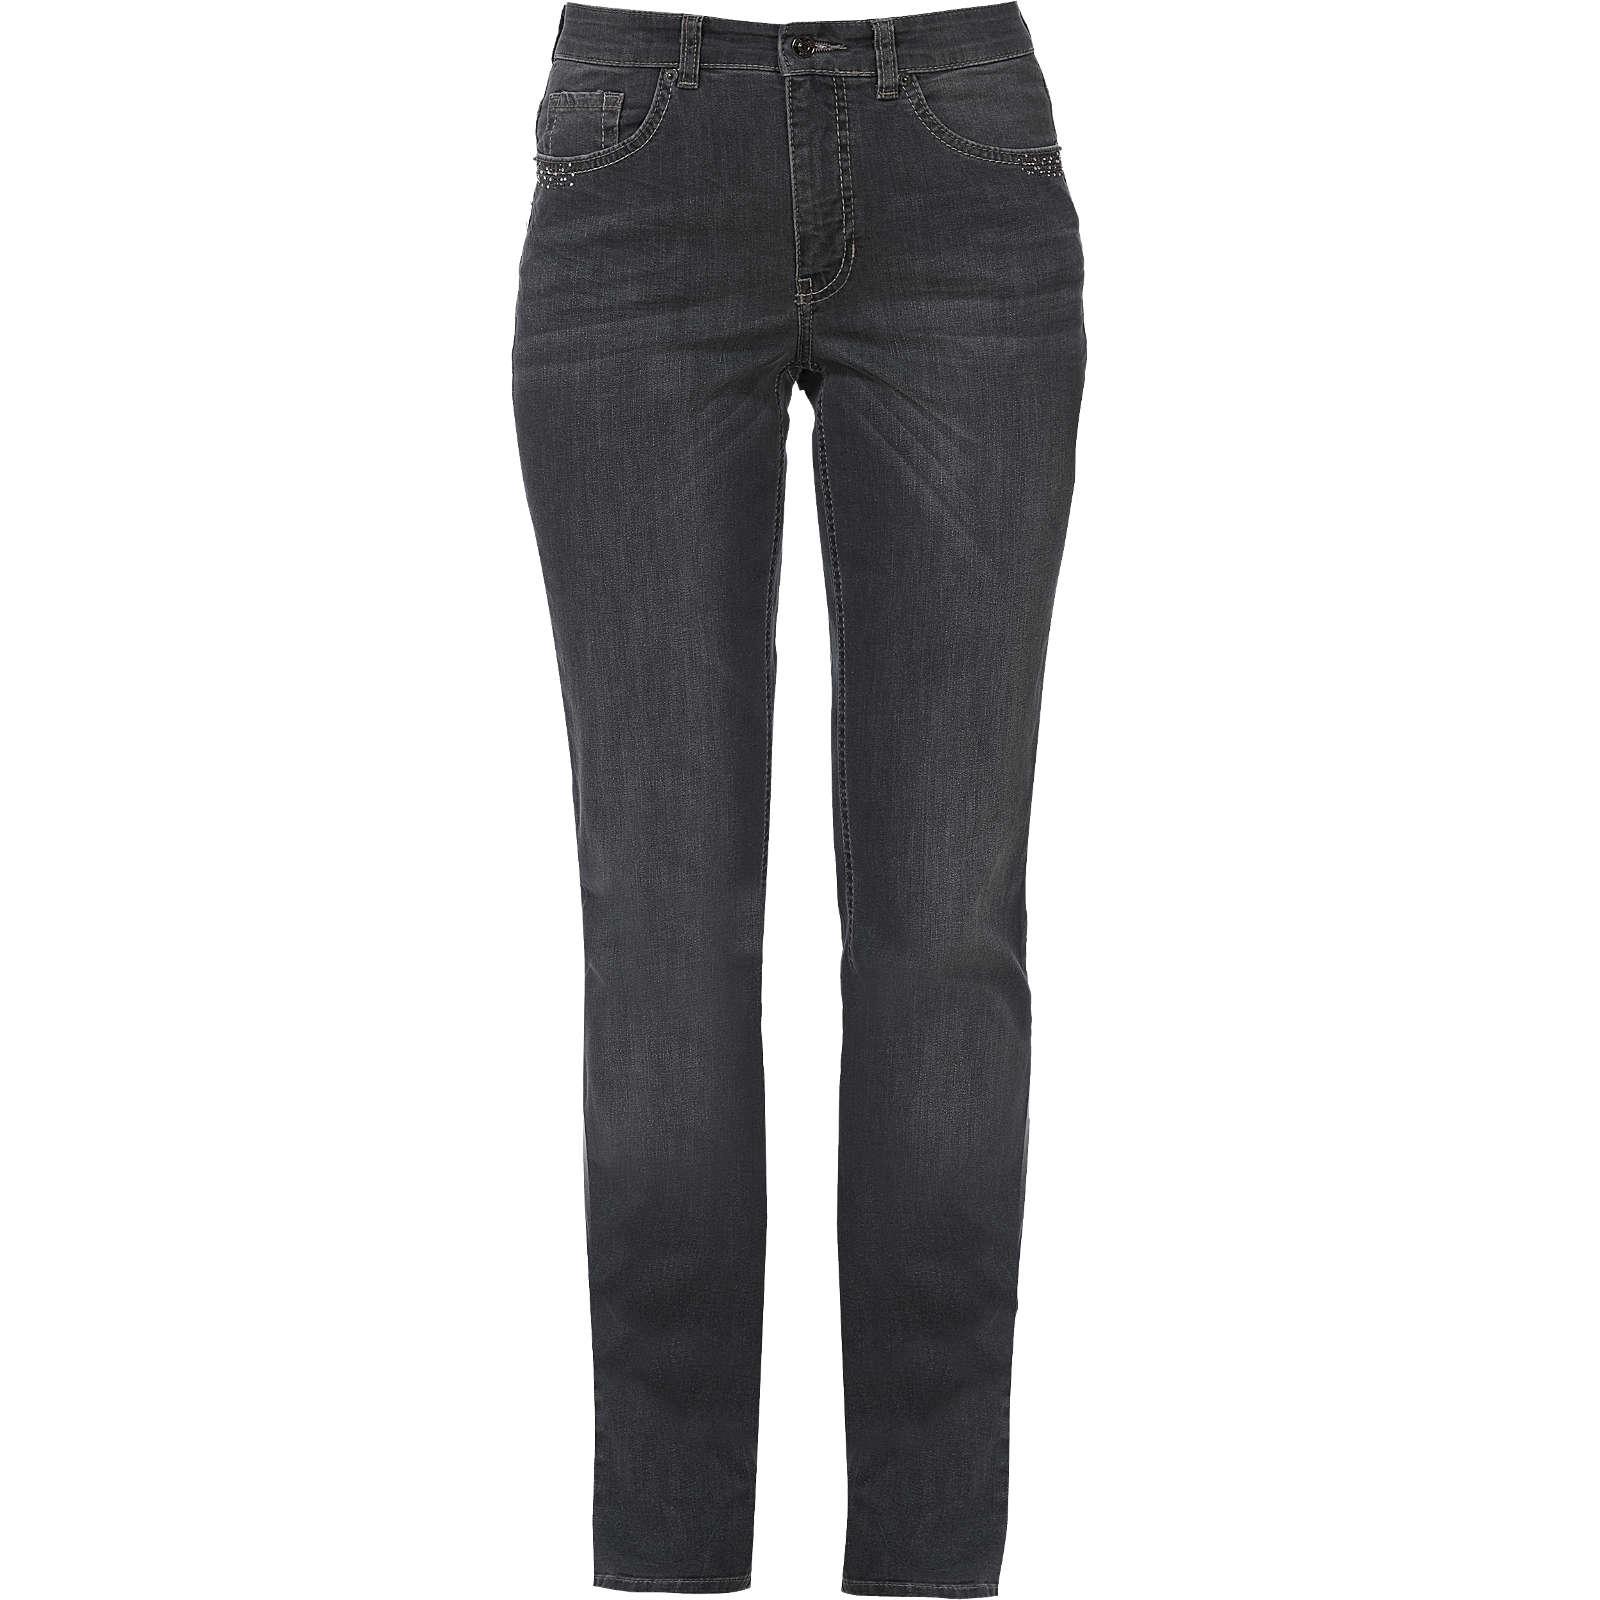 MAC Jeans Melanie Glam Dust Straight grau Damen Gr. 38/L32